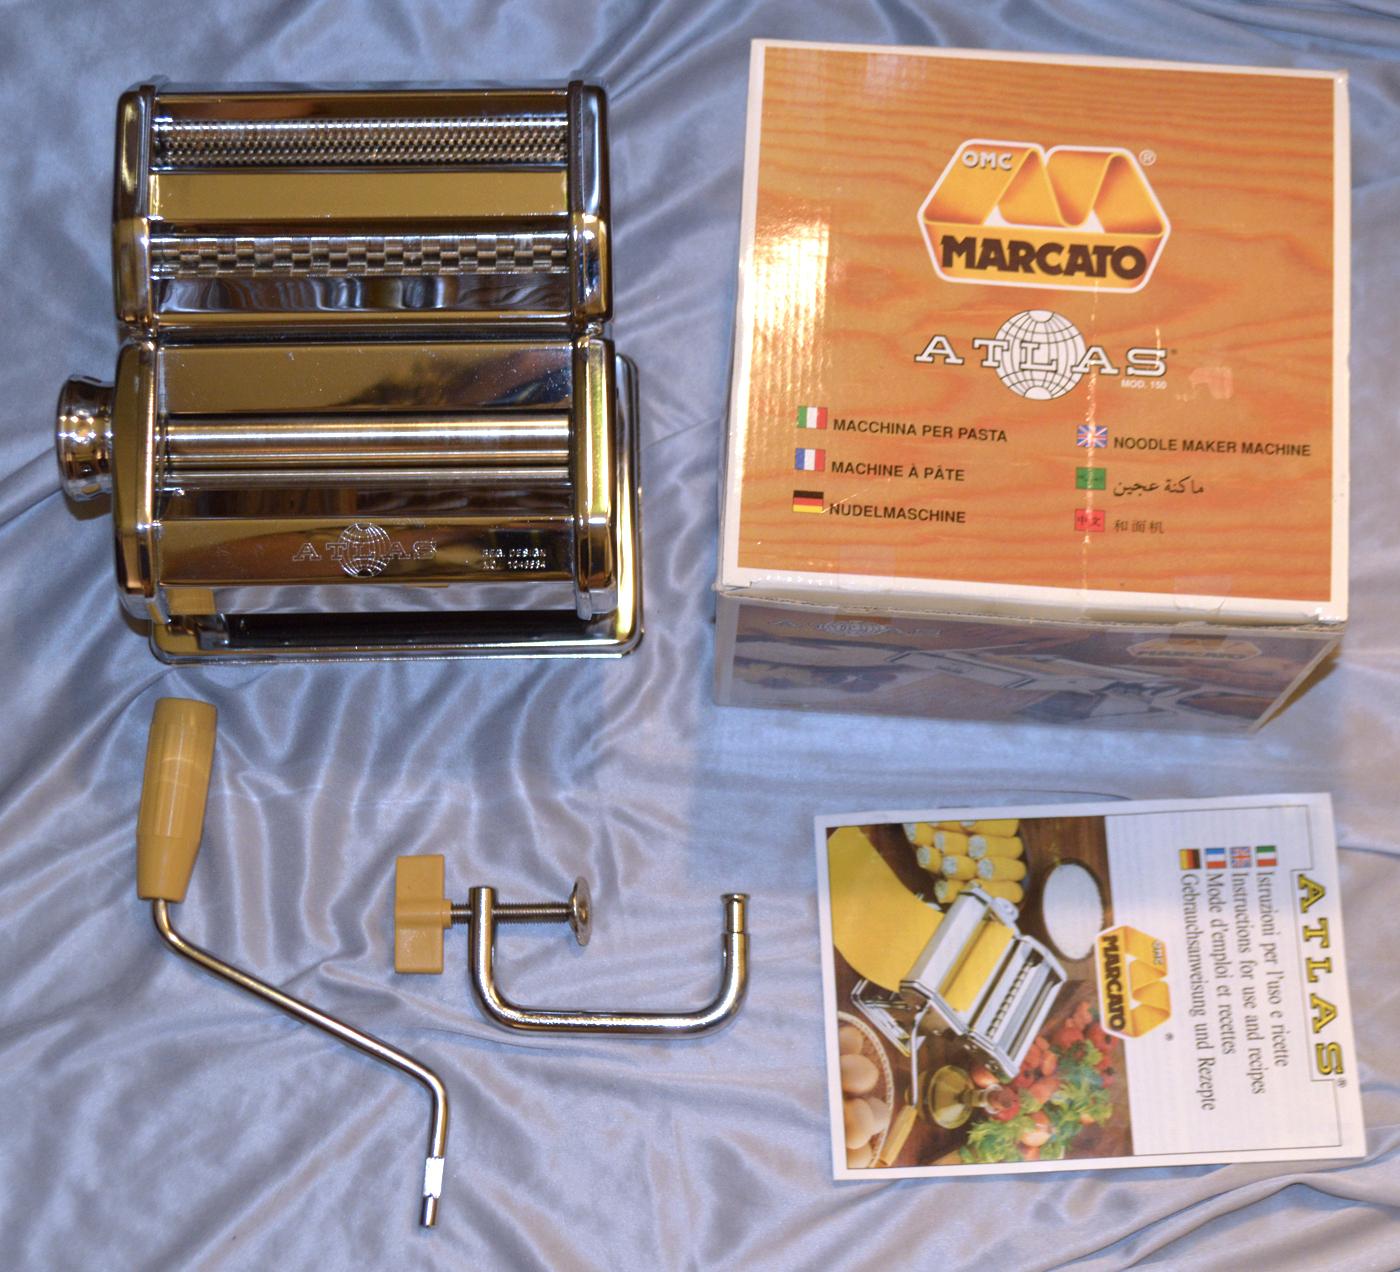 MARCATO Atlas 150 Color home-made Machine à pâtes Lasagnes Maker Aluminium